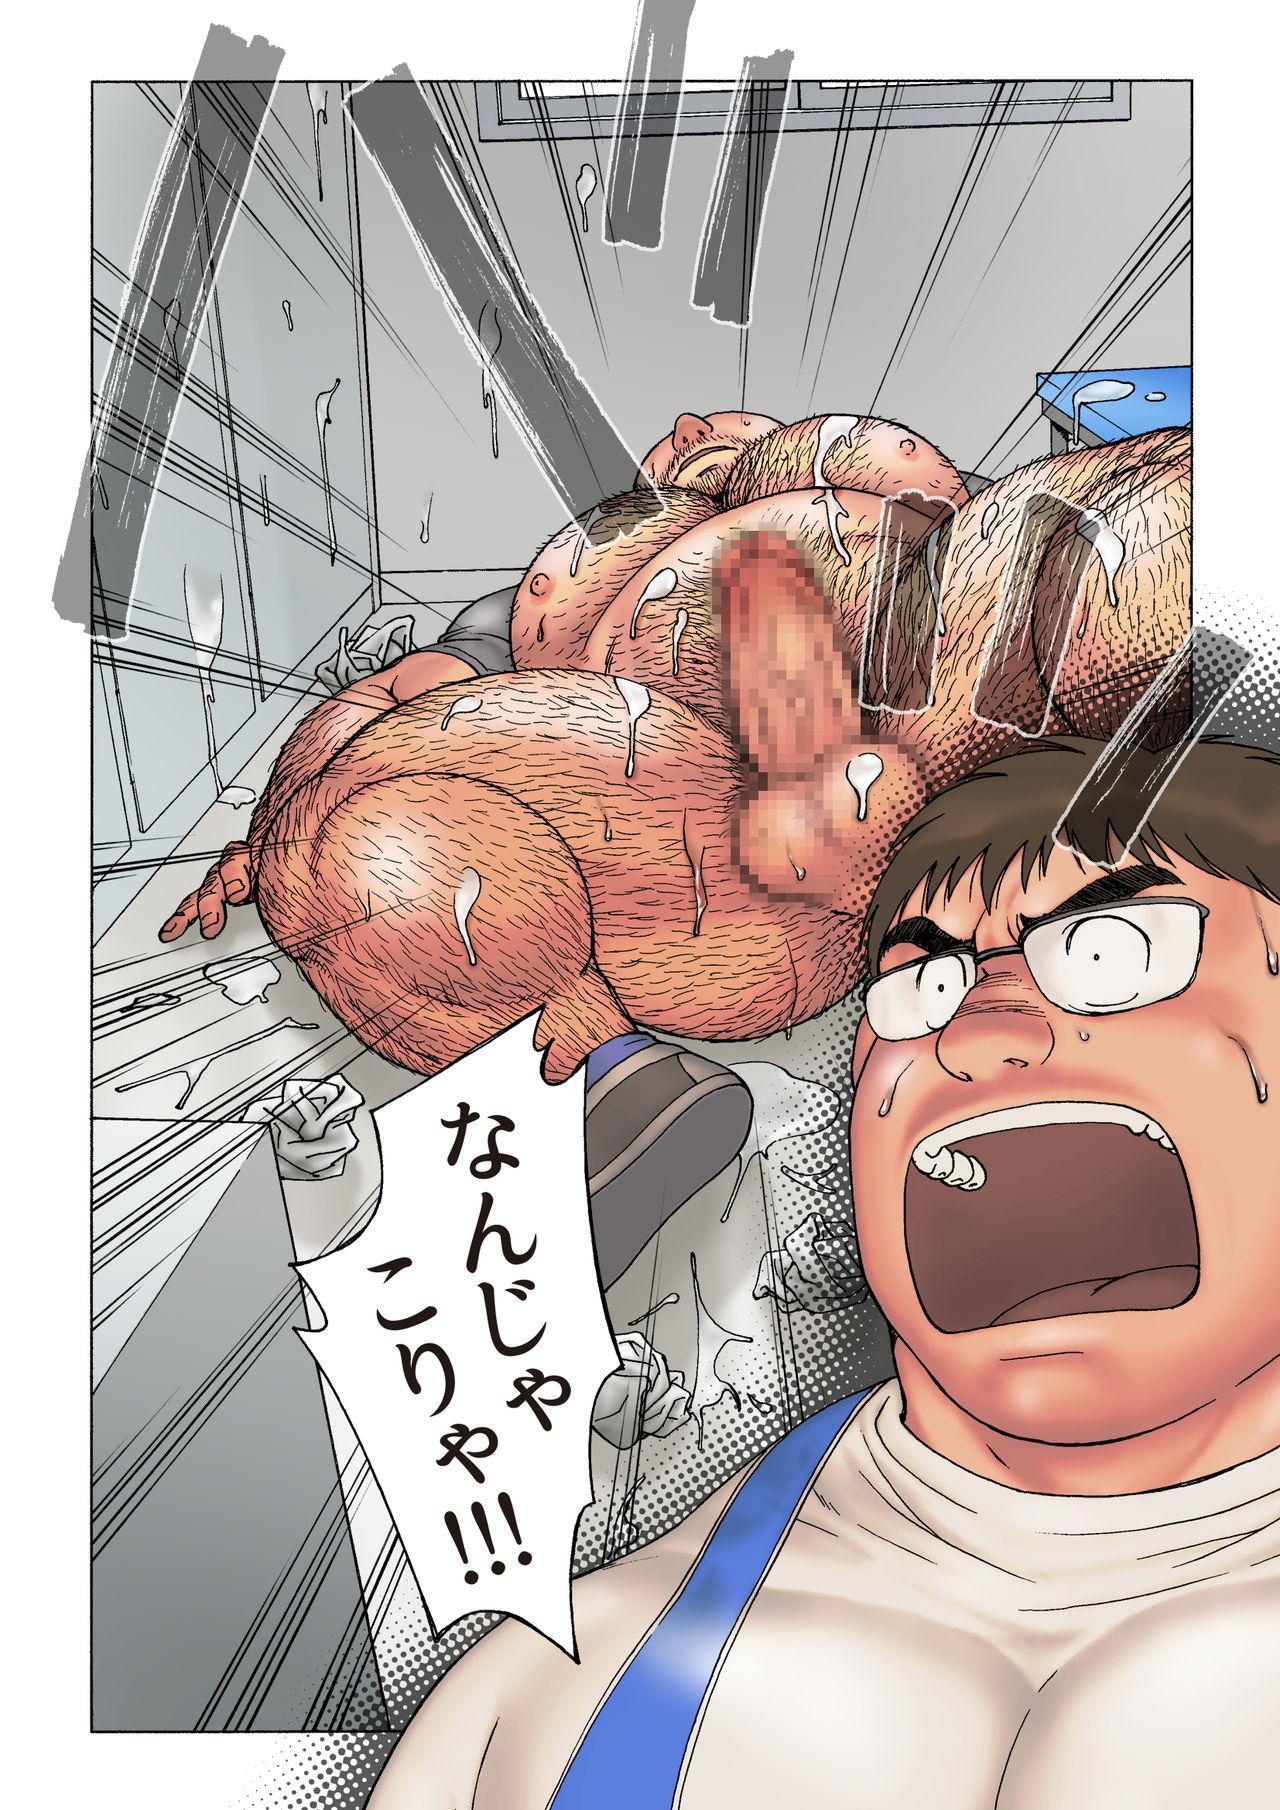 Danshi Koukousei Weightlifter Shiai-chuu, Osae kirenai Wakai Takeri 31